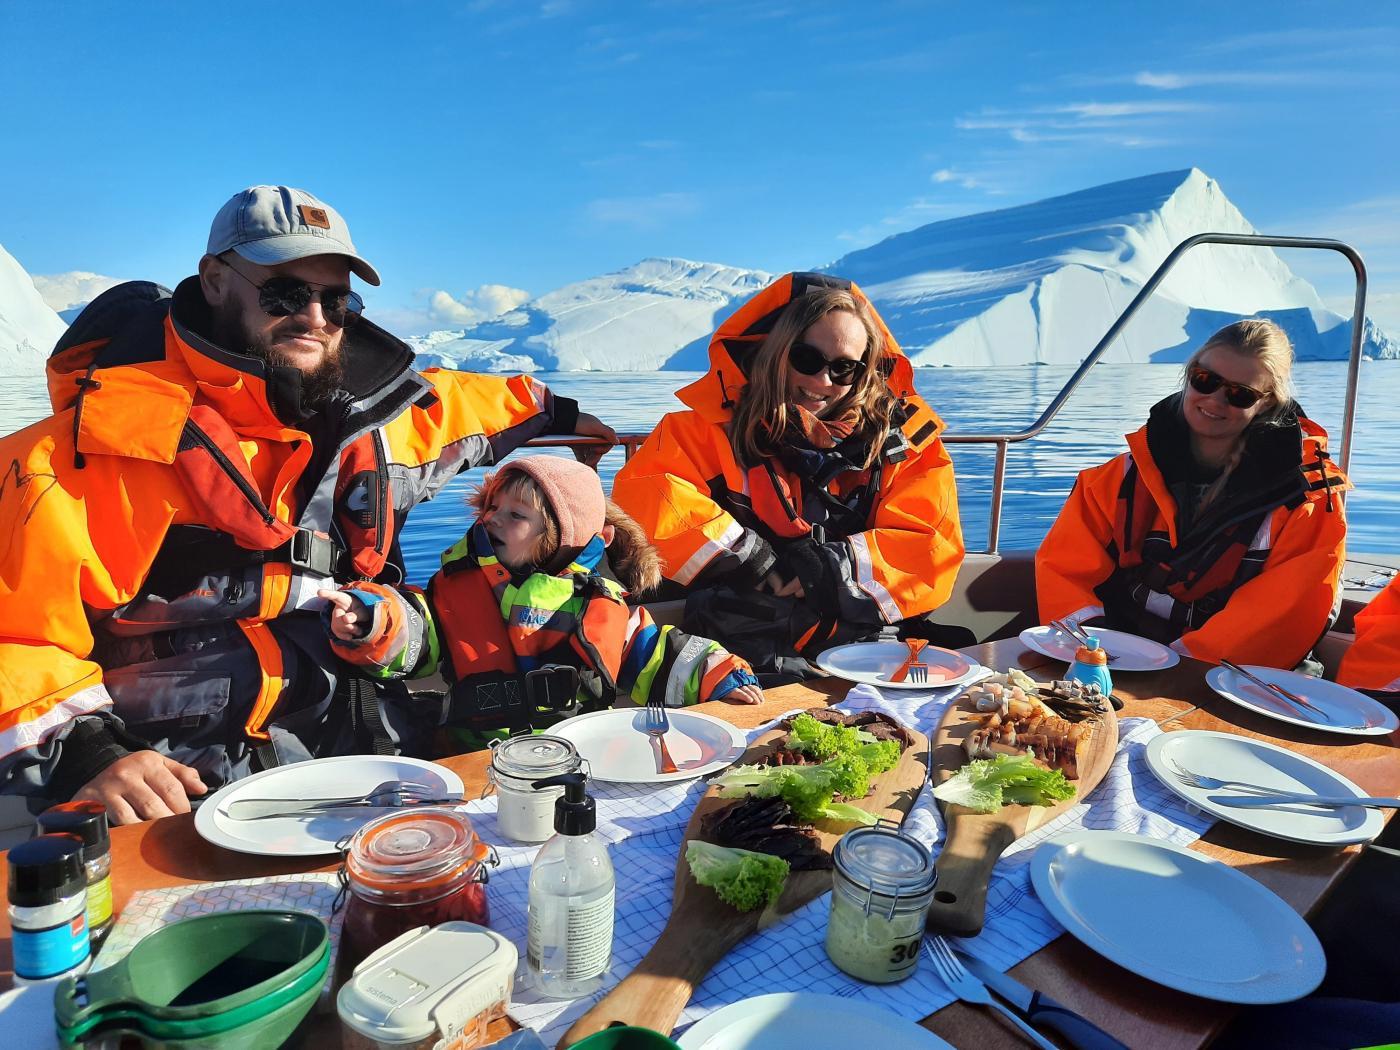 Nuumit frokost på isfjorden. Photo by Ilulissat Adventure